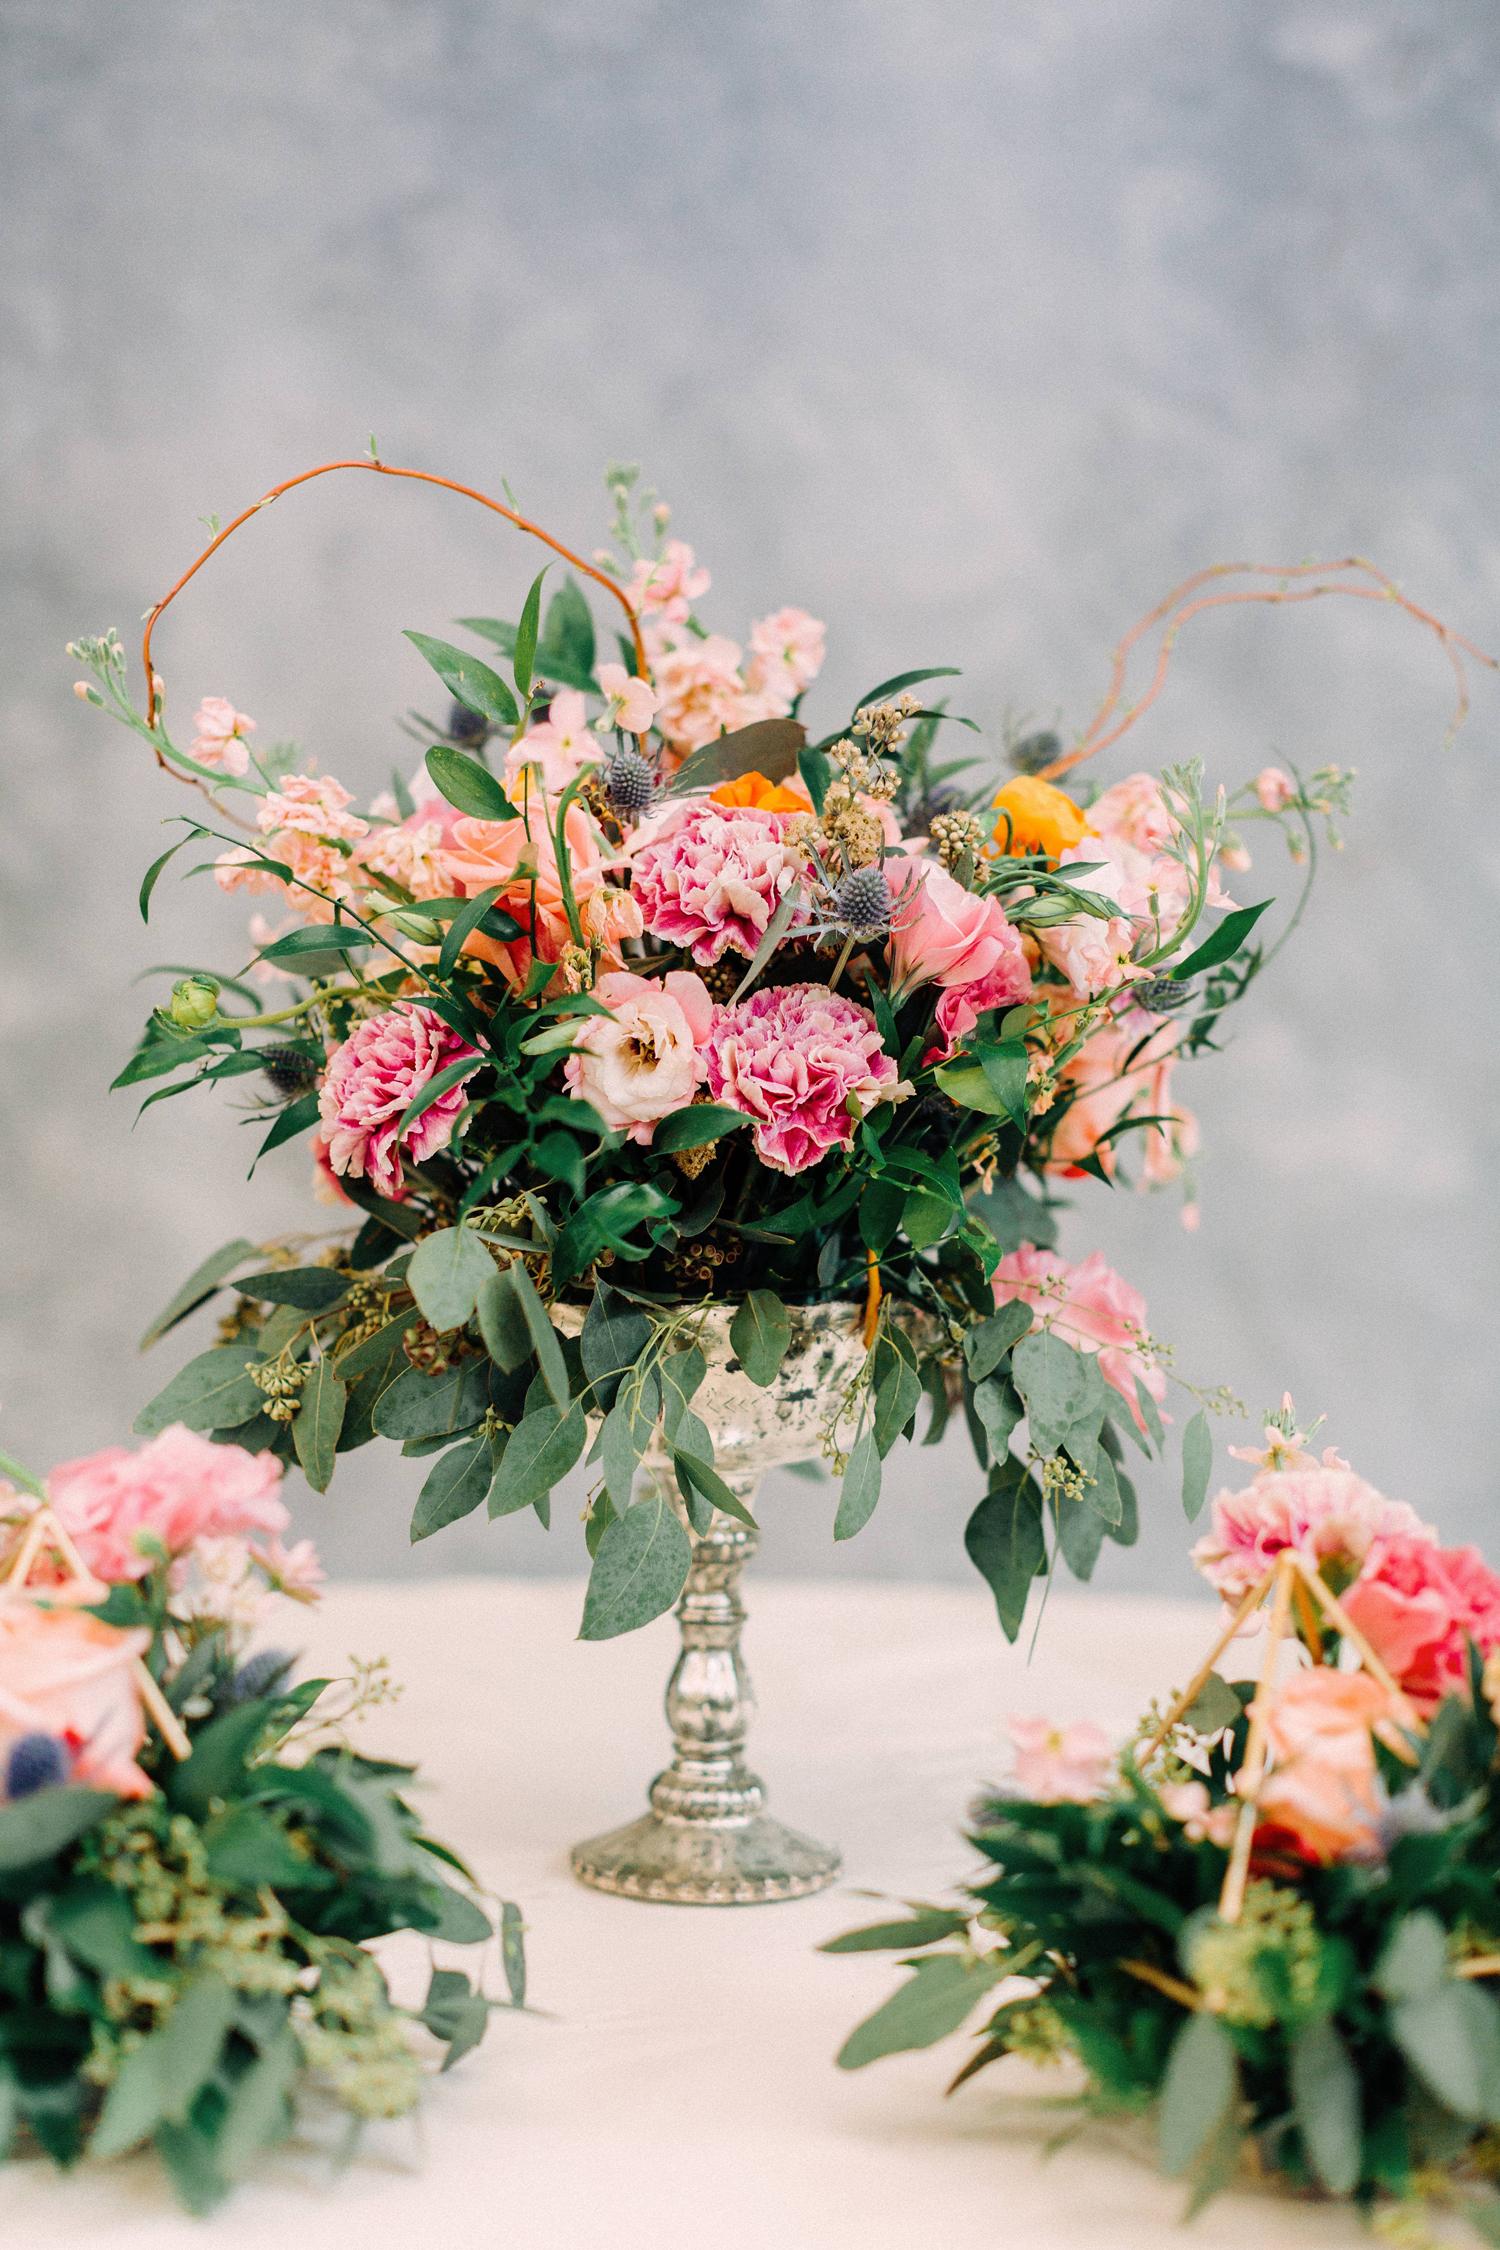 014-alaamarzouk-alaamarzoukphotography-mcallenweddingphotographer-alaa-marzouk-mcallen-mission-wedding-texas-venue-photography-wedding-california-bride-bridal-engagement-austin-elopement.jpg